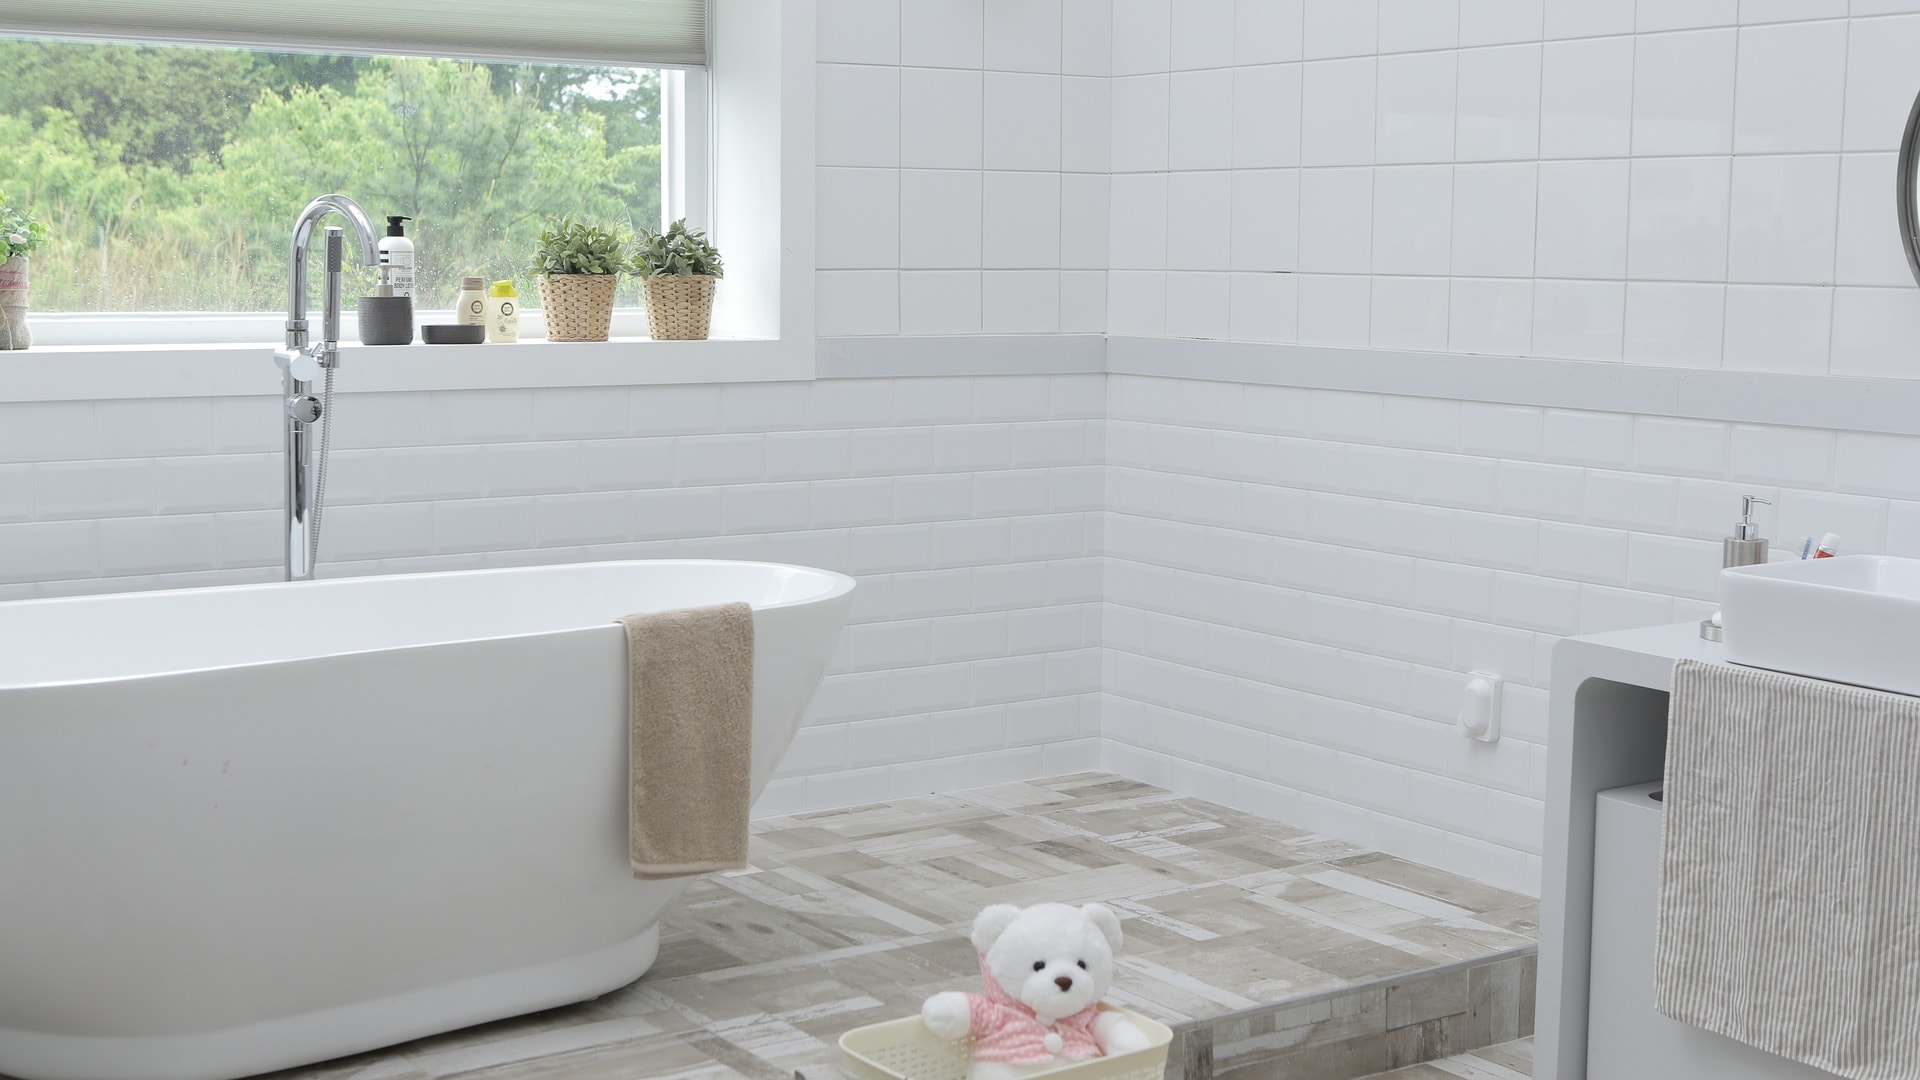 Environmentally Friendly Bathroom